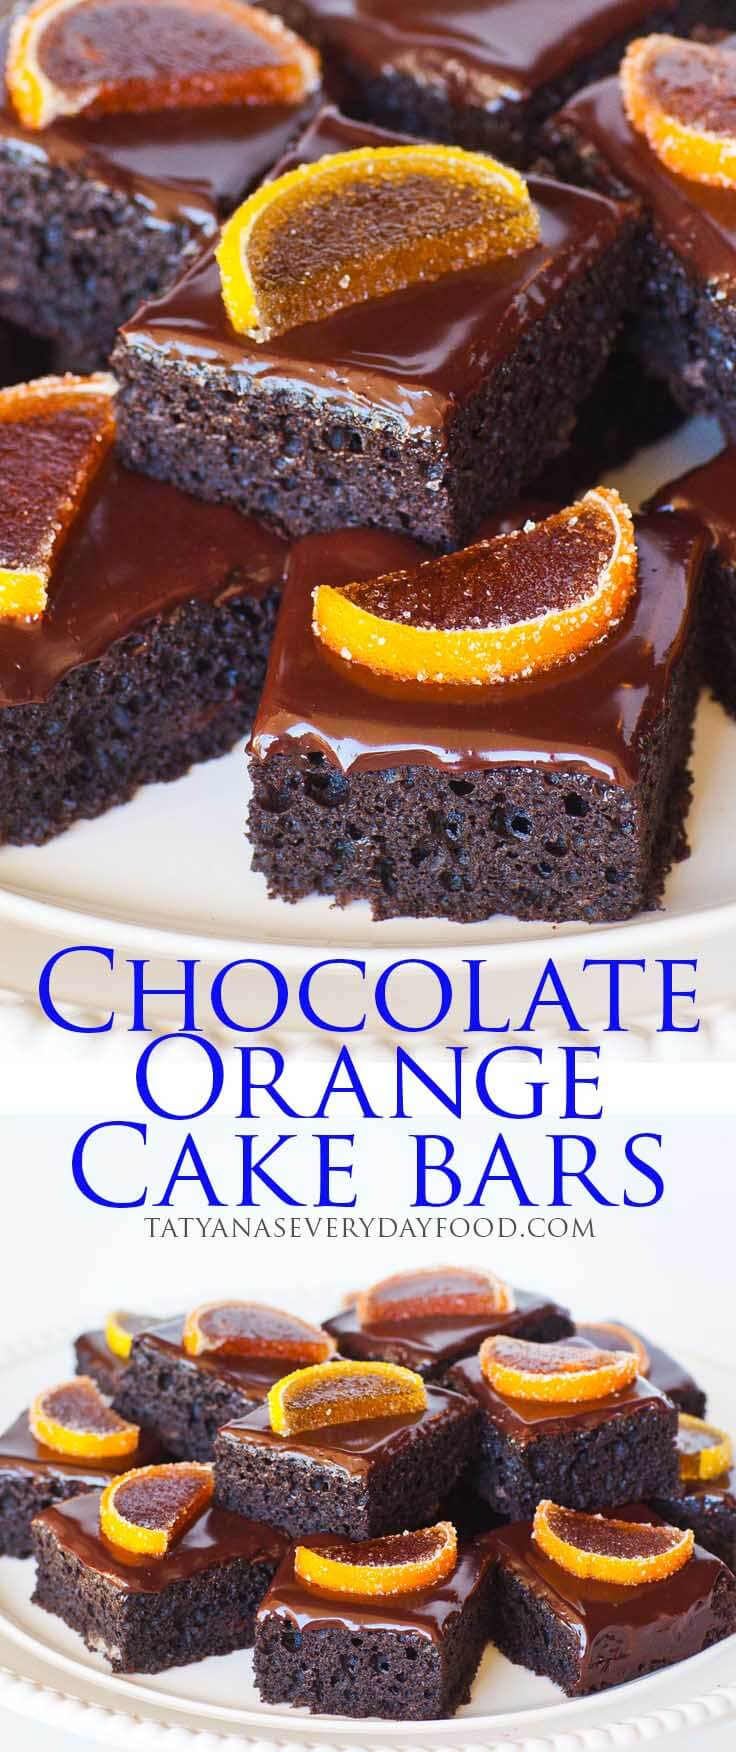 Chocolate Orange Cake Bars Recipe